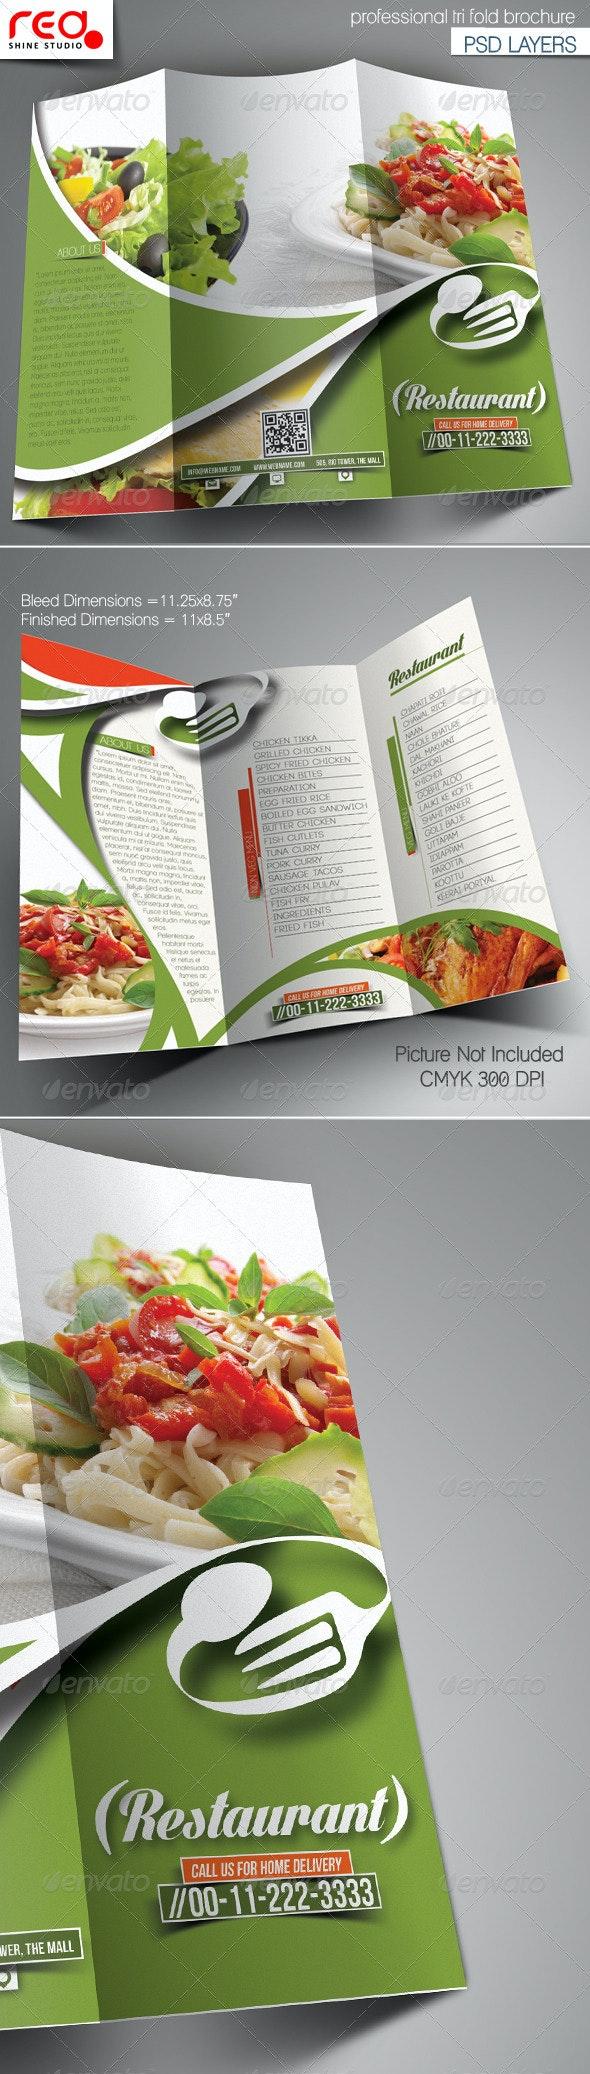 Restaurant Trifold Brochure Template - Catalogs Brochures